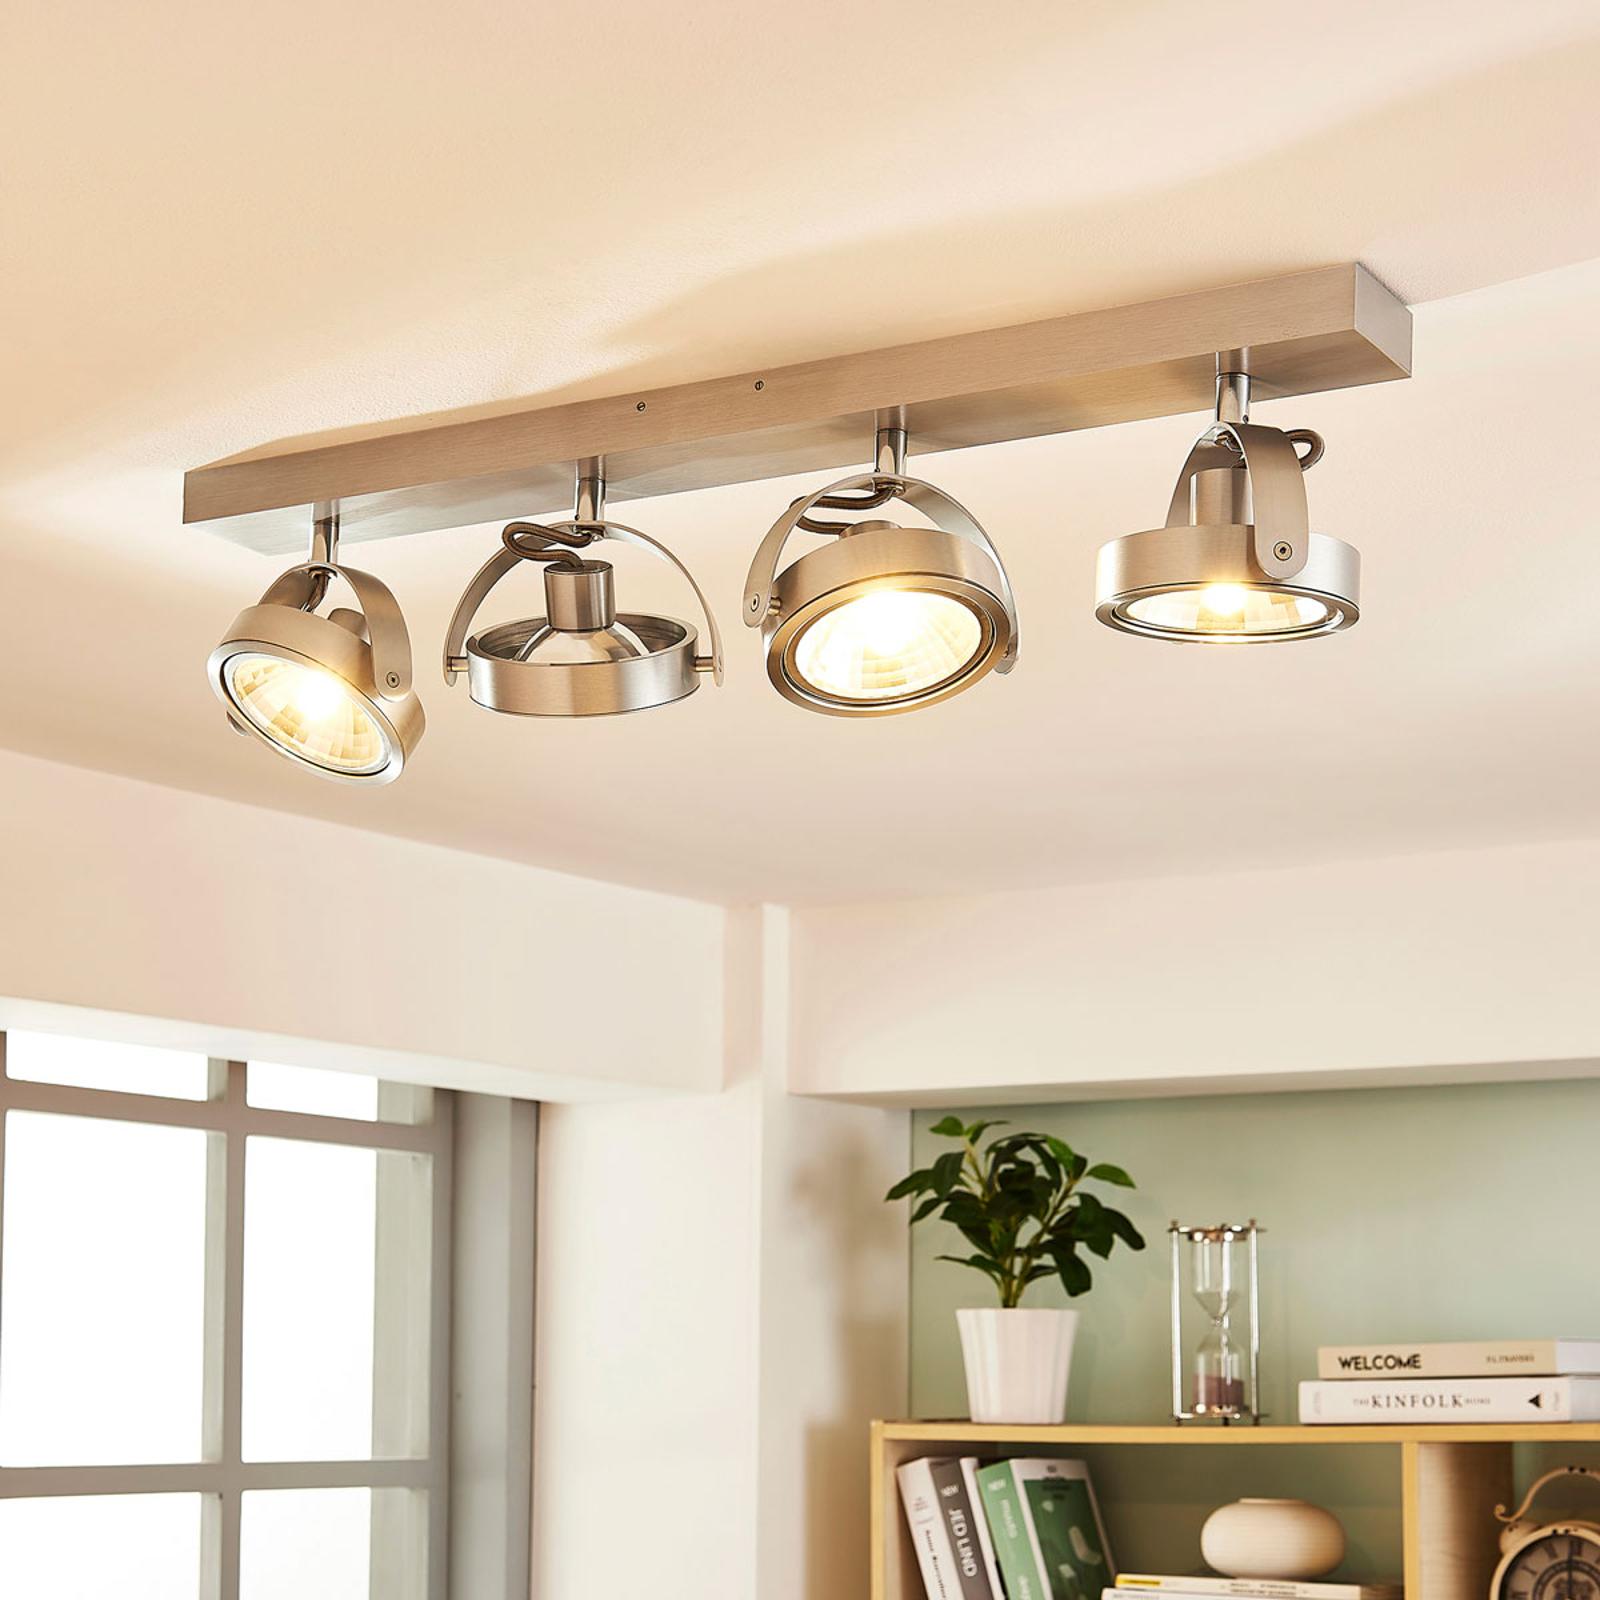 LED-taklampe Lieven i aluminium, med 4 lys